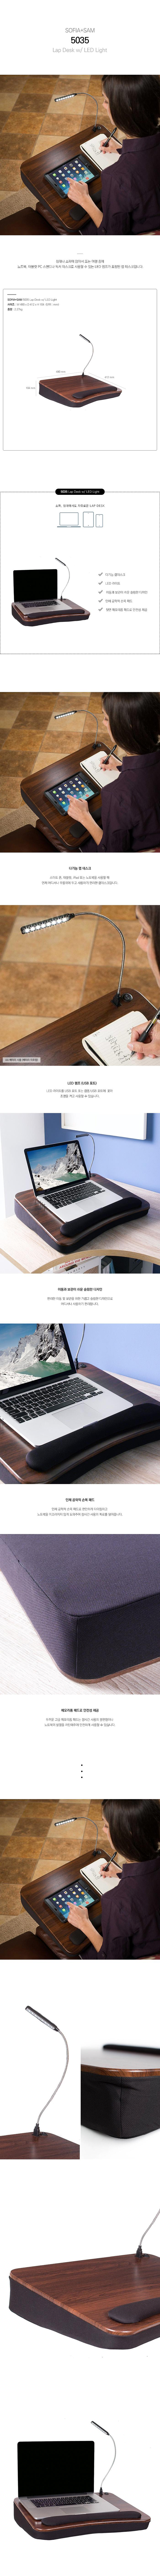 10_6_5035_Lap-Desk.jpg